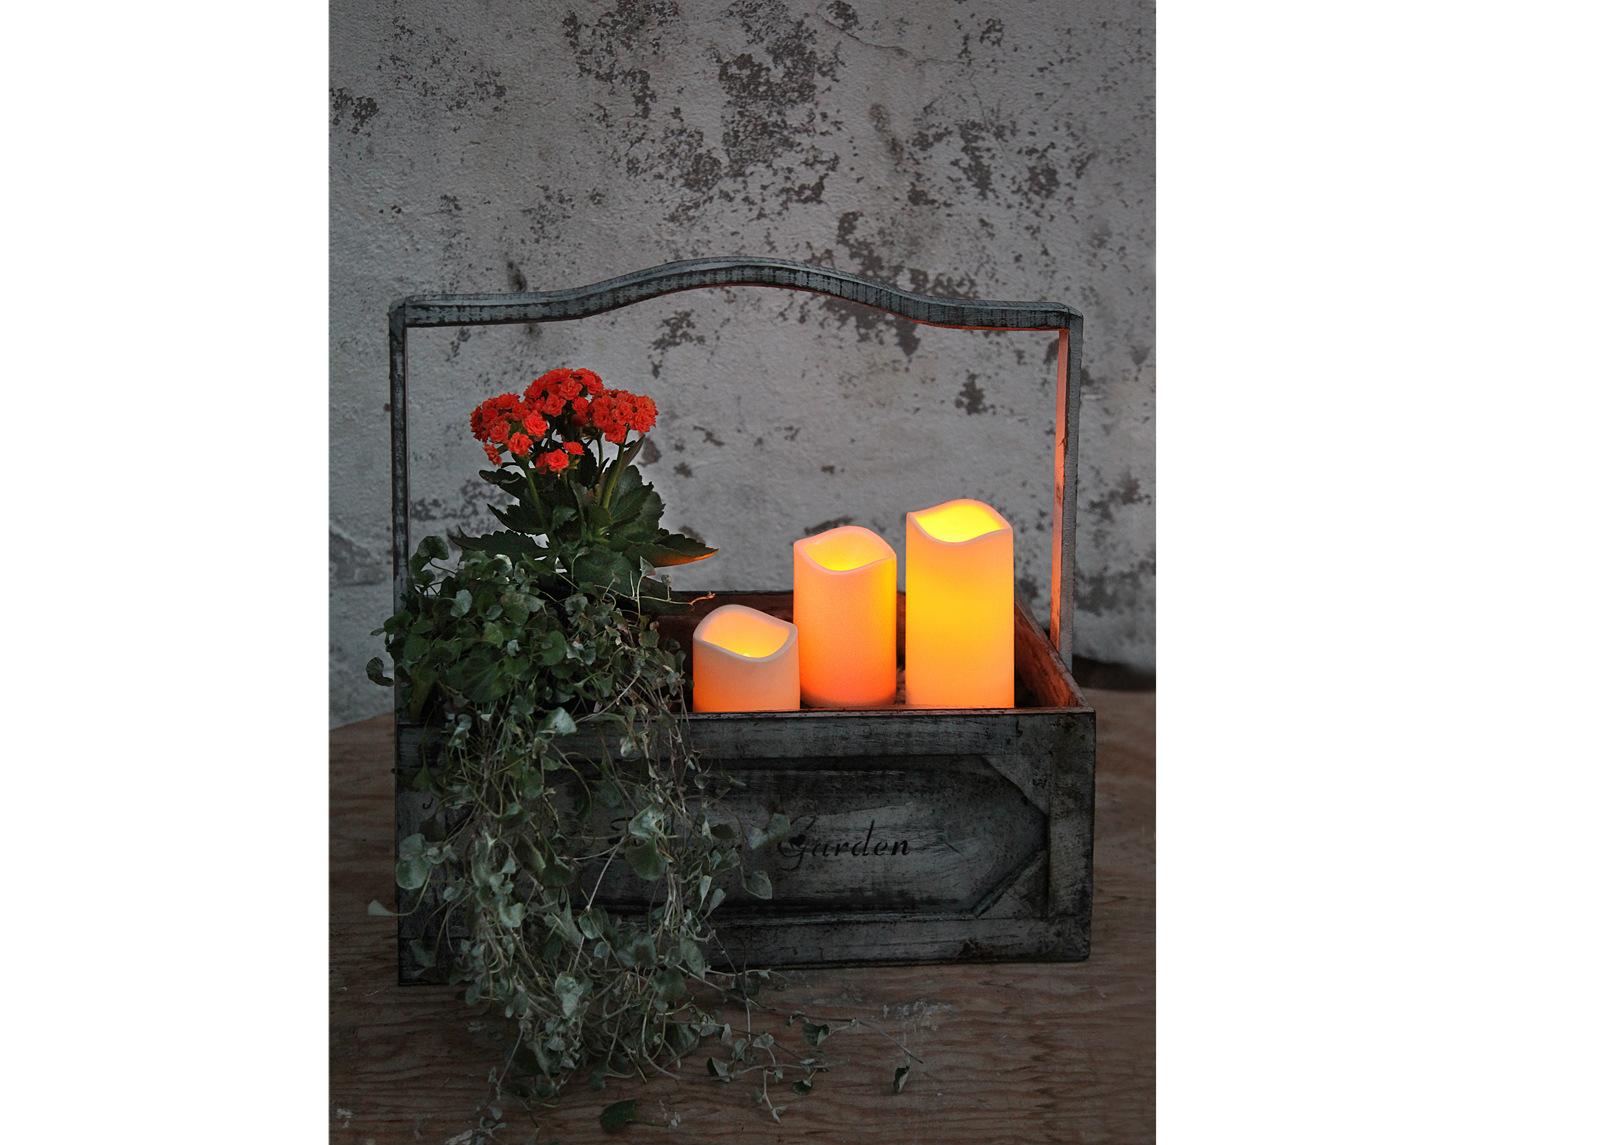 LED kynttilä ajastimella 7,5 cm